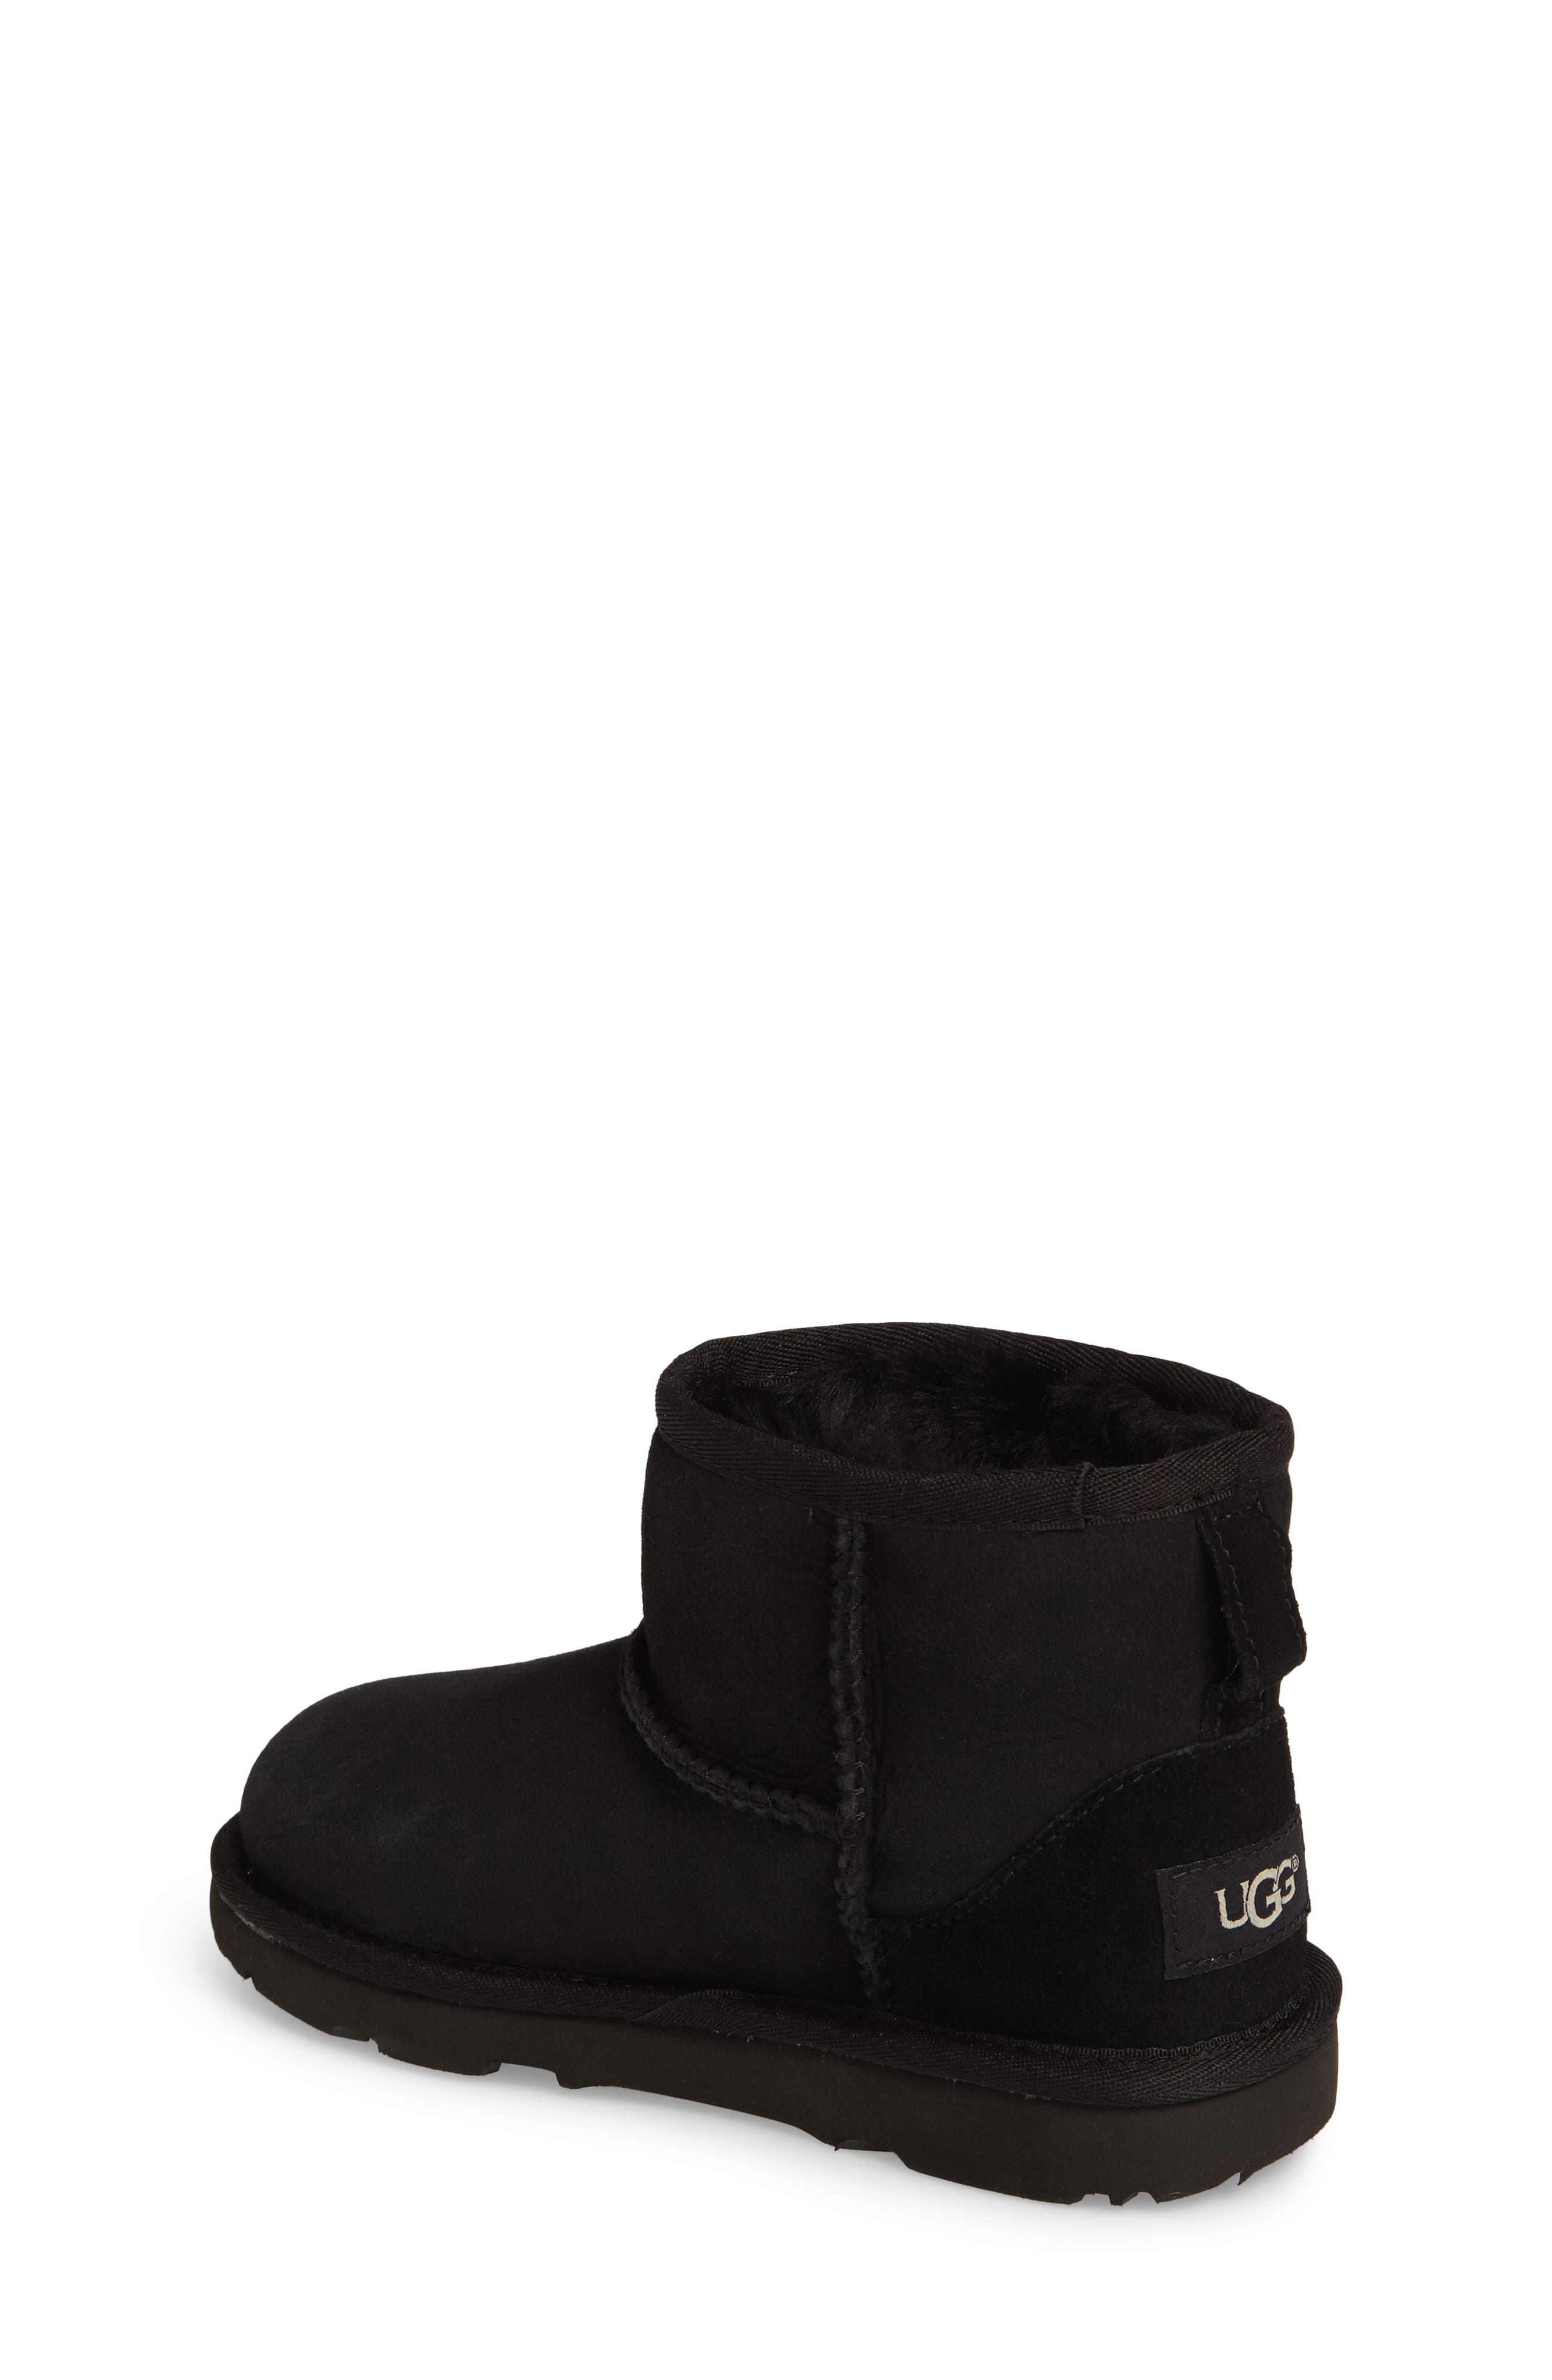 UGG<SUP>®</SUP>, Classic Mini II Water-Resistant Genuine Shearling Boot, Alternate thumbnail 2, color, BLACK